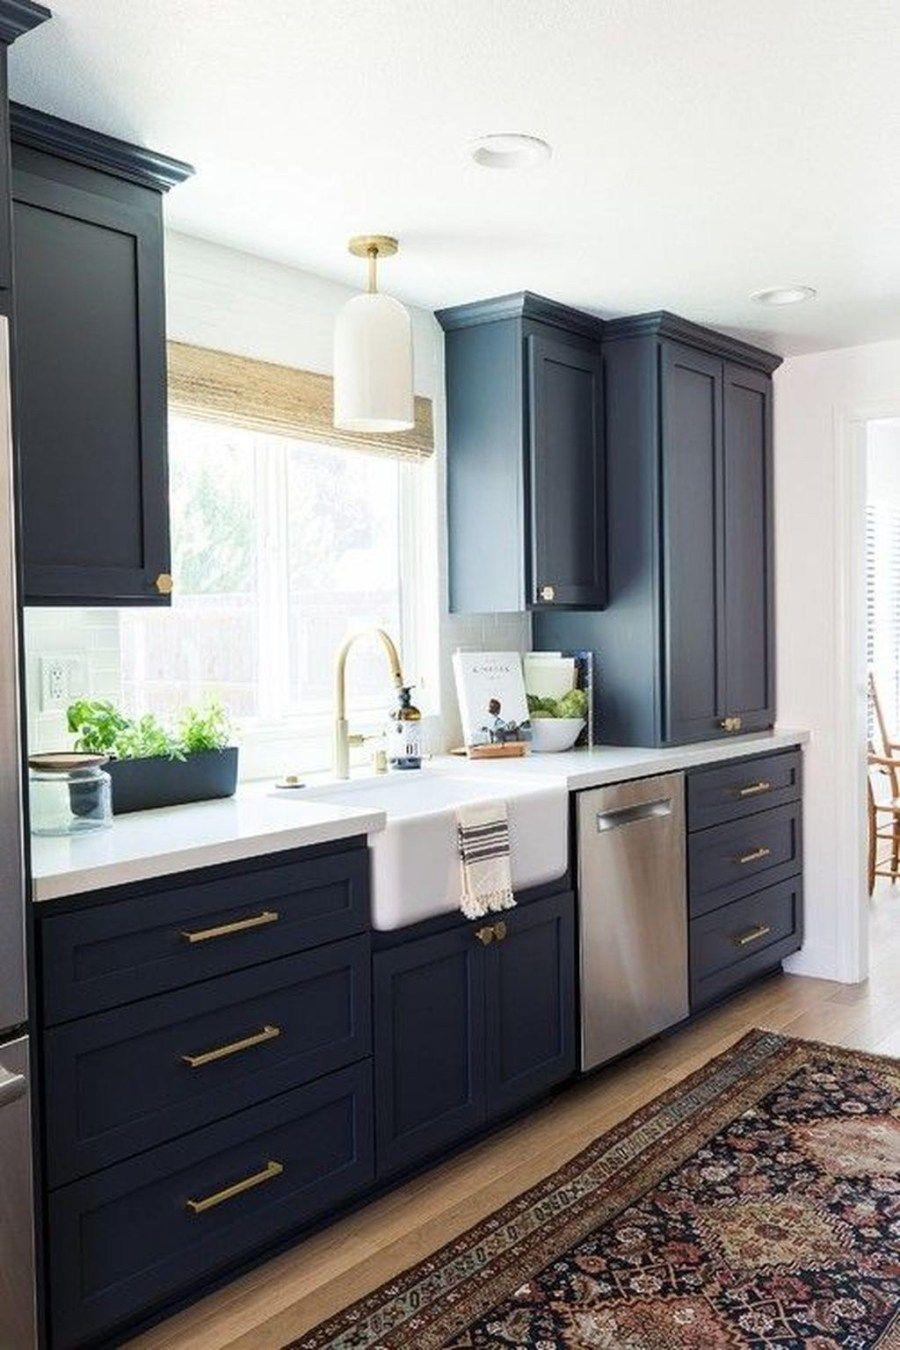 stunning small farmhouse kitchen decor ideas best for your farmhouse design 11 in 2020 kitchen on farmhouse kitchen small id=61362